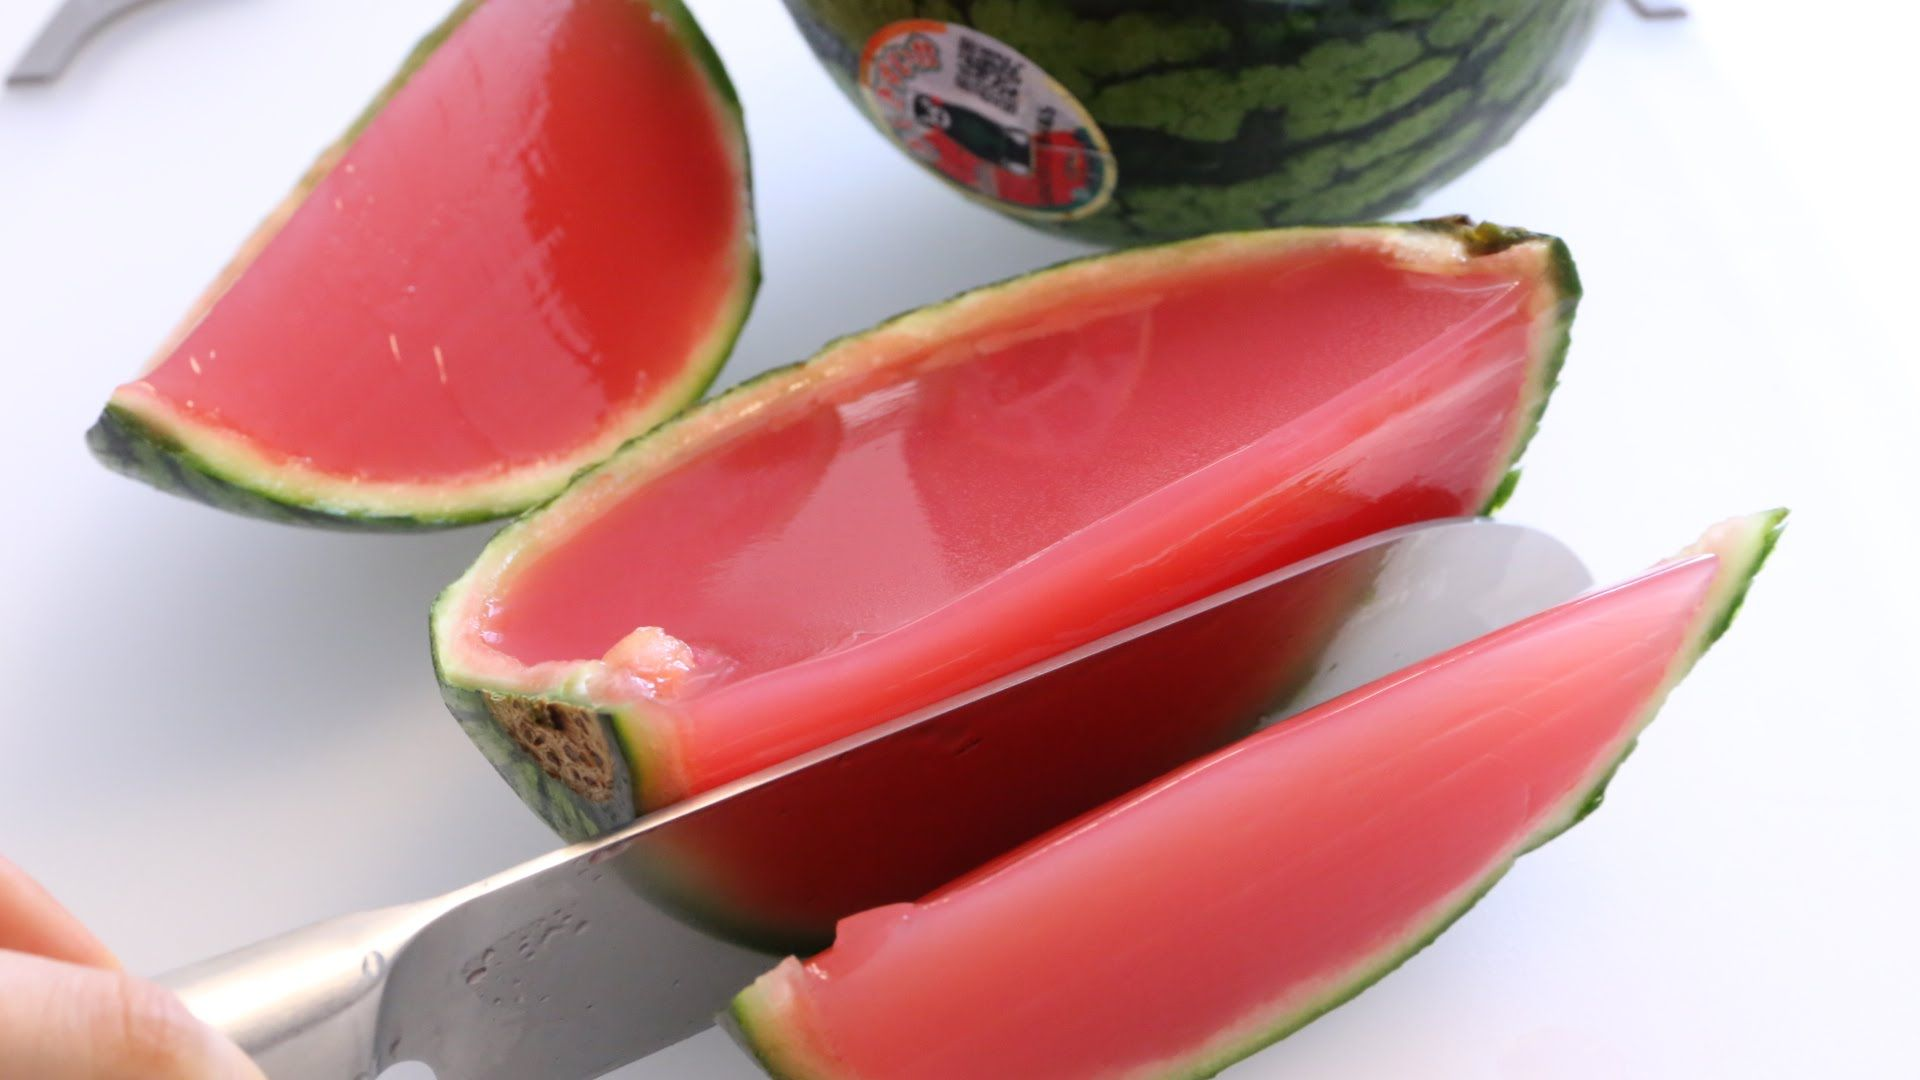 Watermelon Jelly Cake Recipe: Giant Jello Shot I Made Whole Watermelon Jelly! Thank You